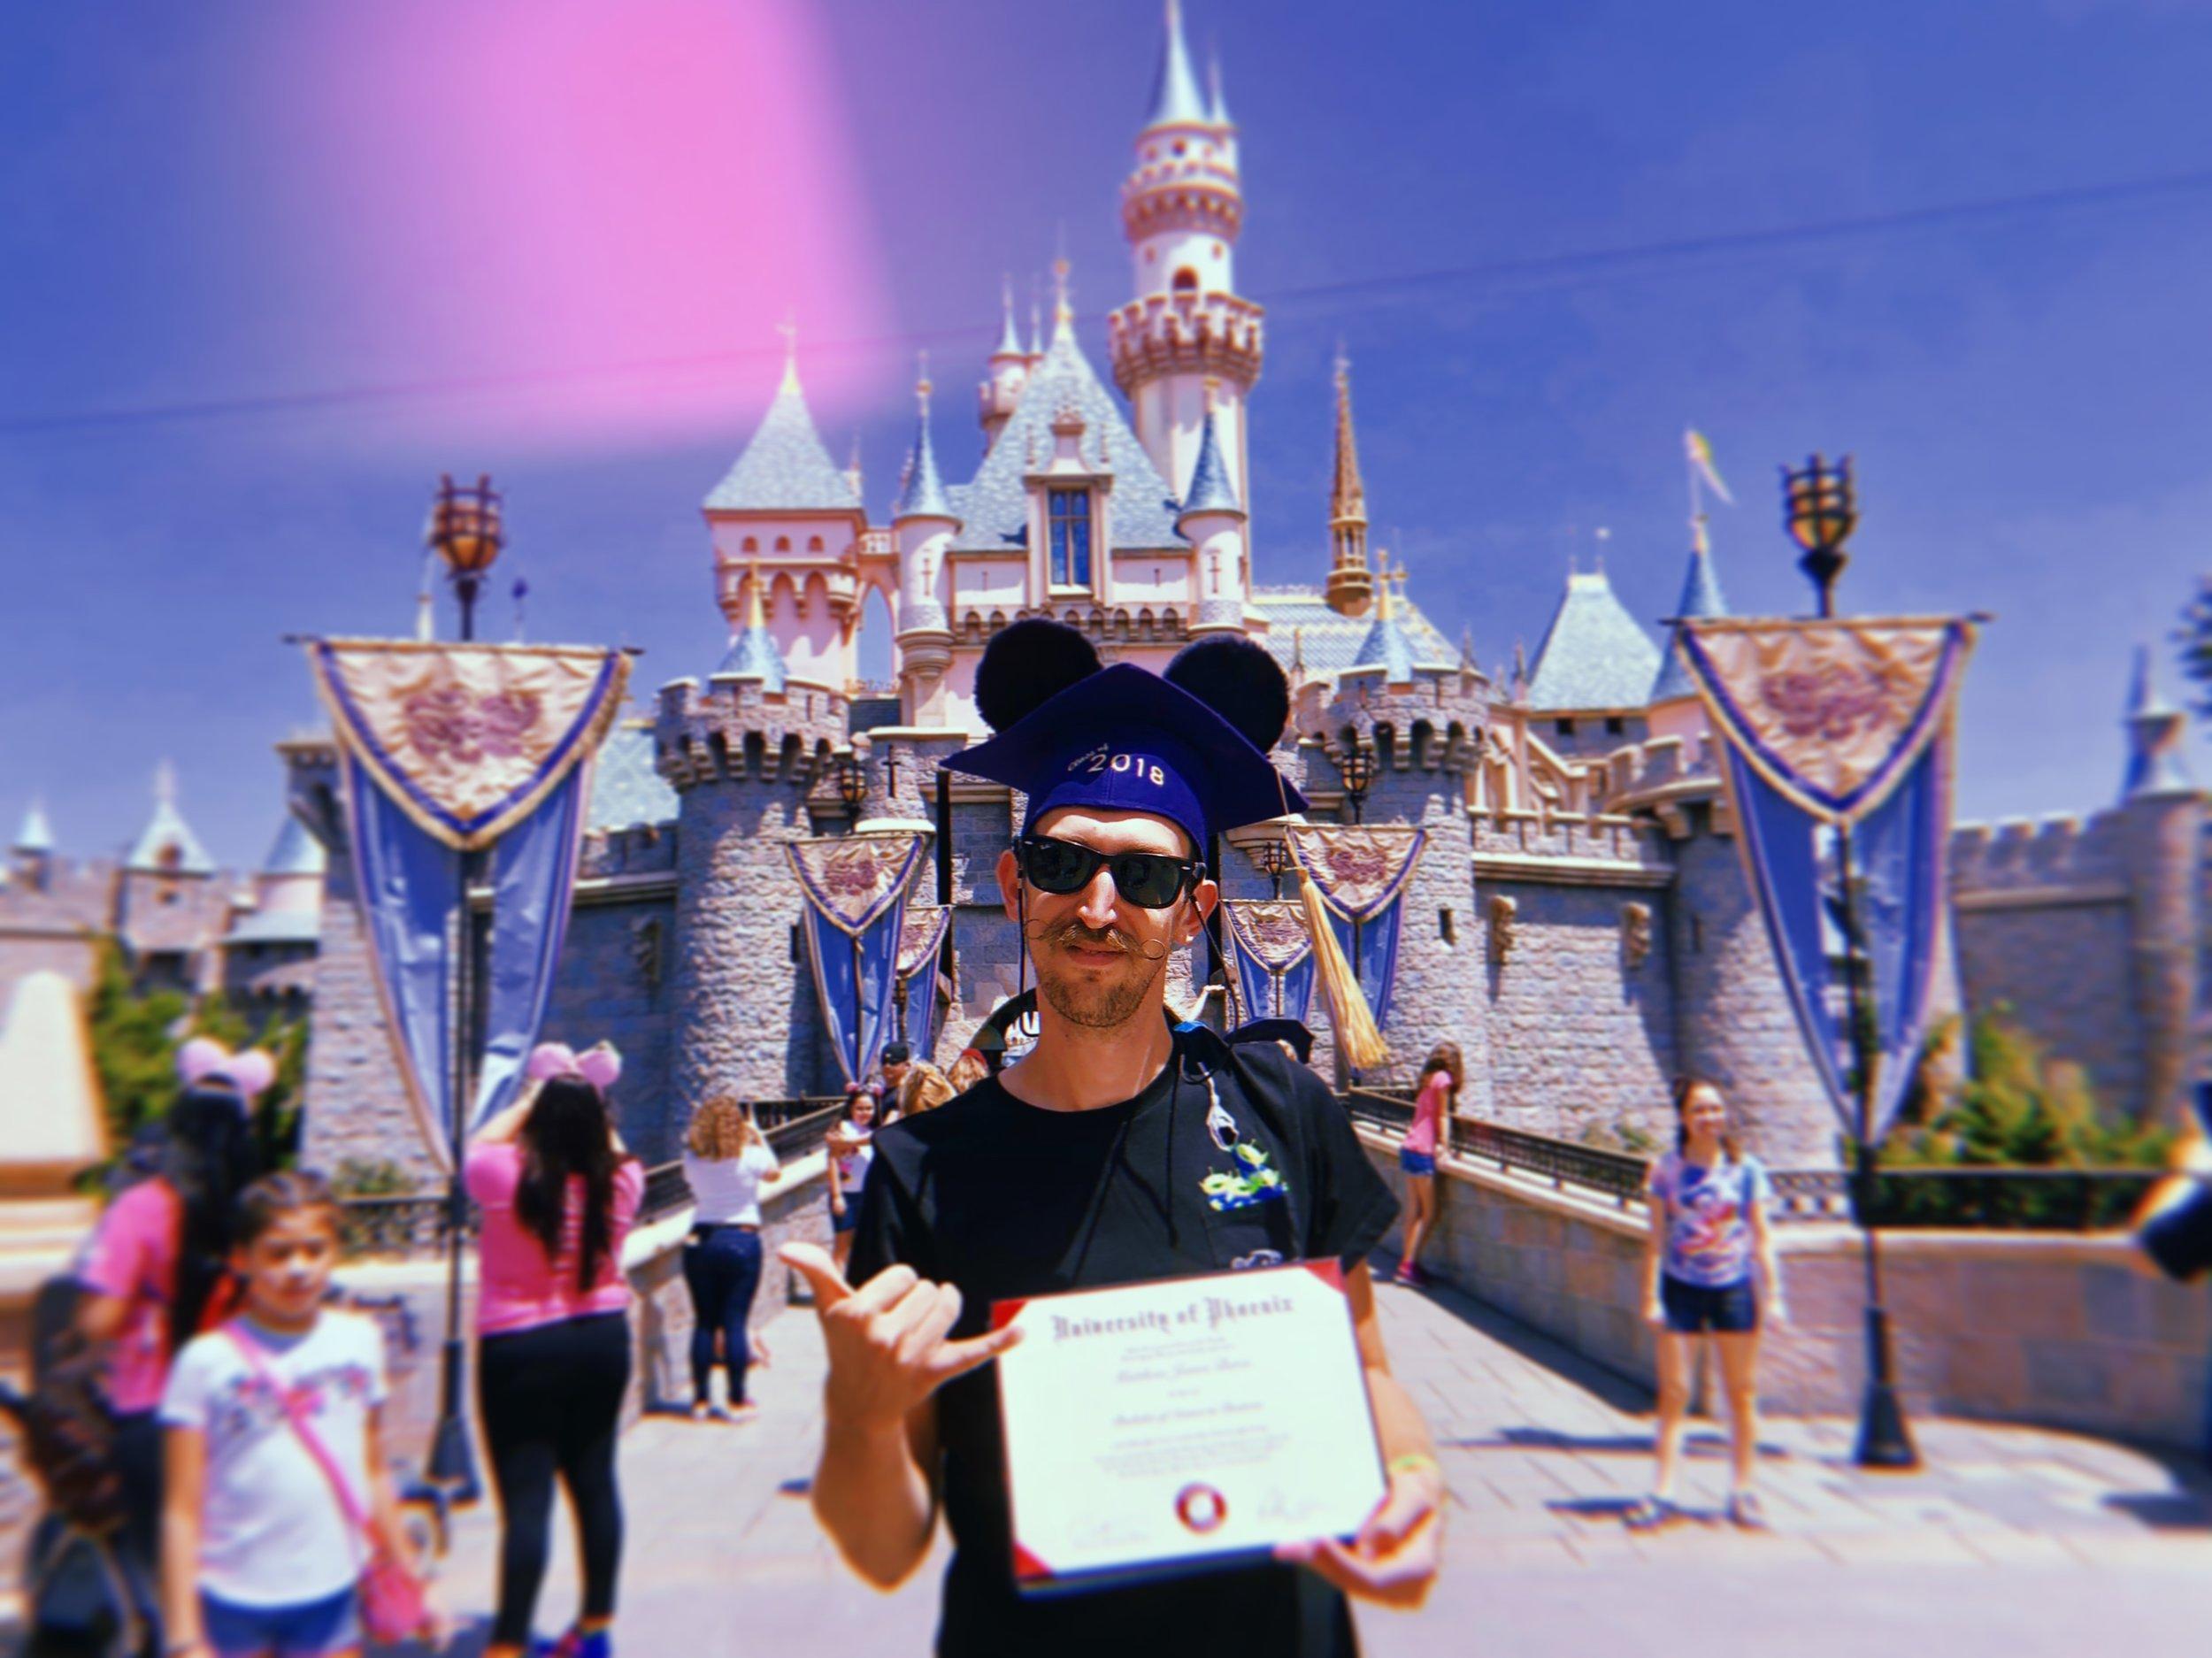 My own graduation walk - Disneyland - Summer 2018